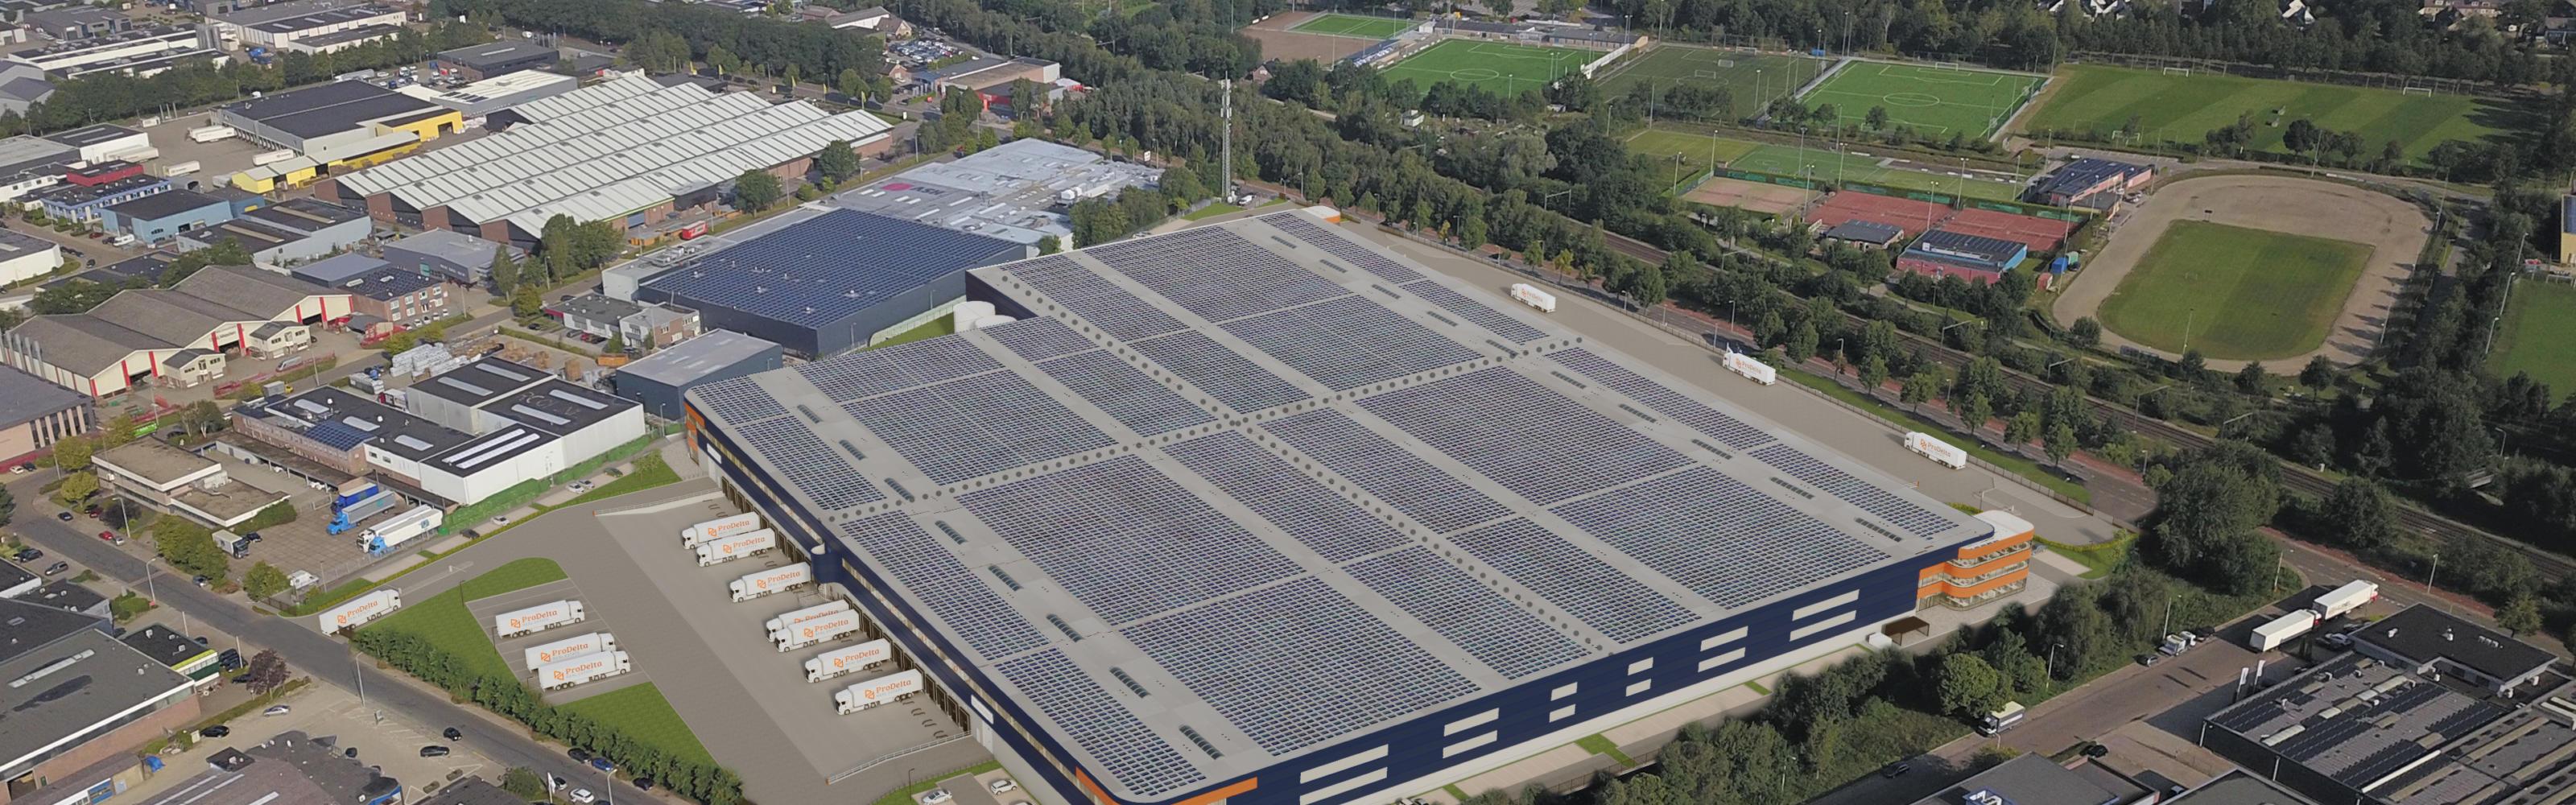 1521-luchtfoto-achterzijde_03.jpg